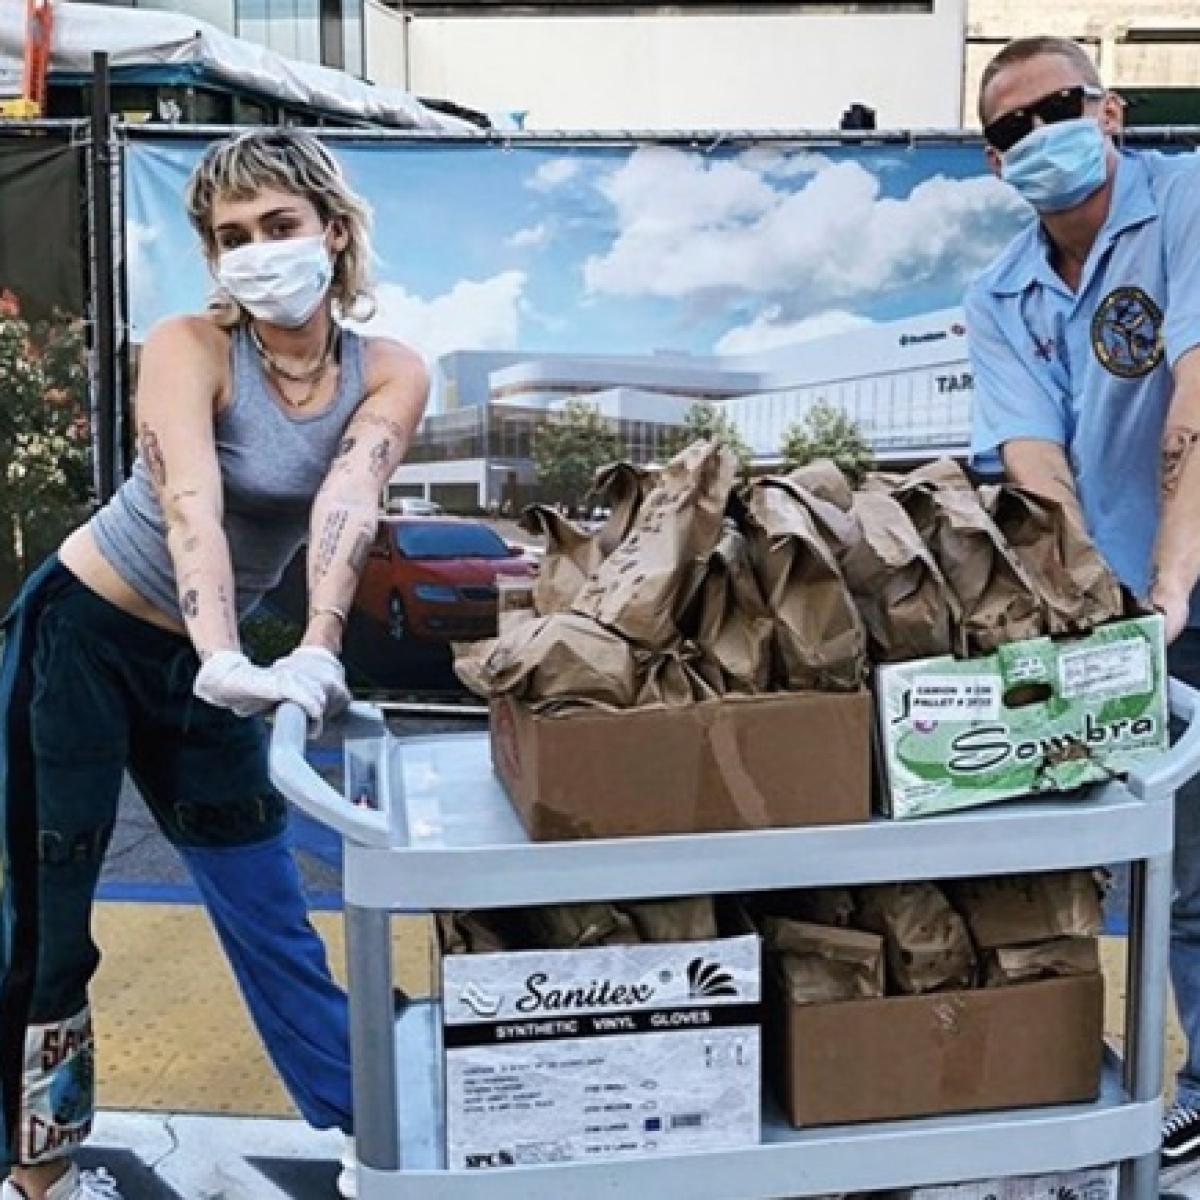 Miley Cyrus, Cody Simpson deliver tacos to healthcare workers amid coronavirus lockdown